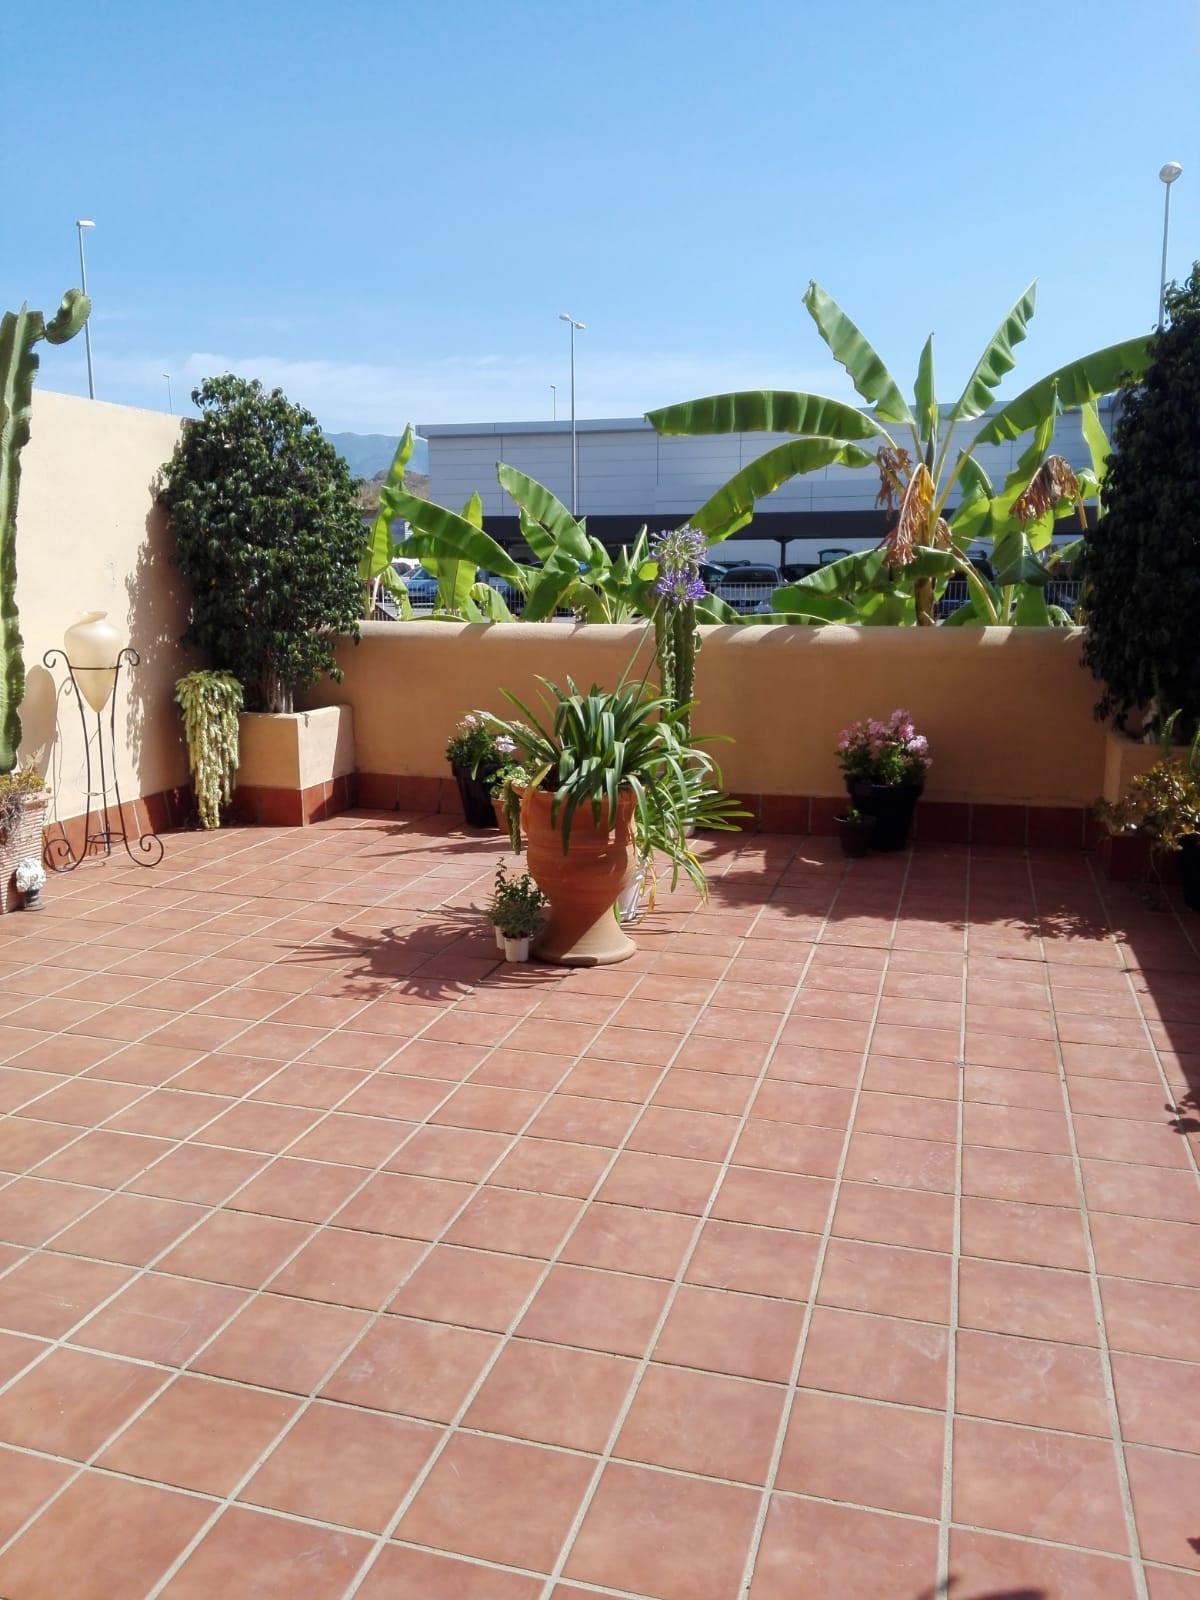 Reserved!   Ground floor apartment for sale in La cala de Mijas, next to Lidl and overhead bridge to,Spain